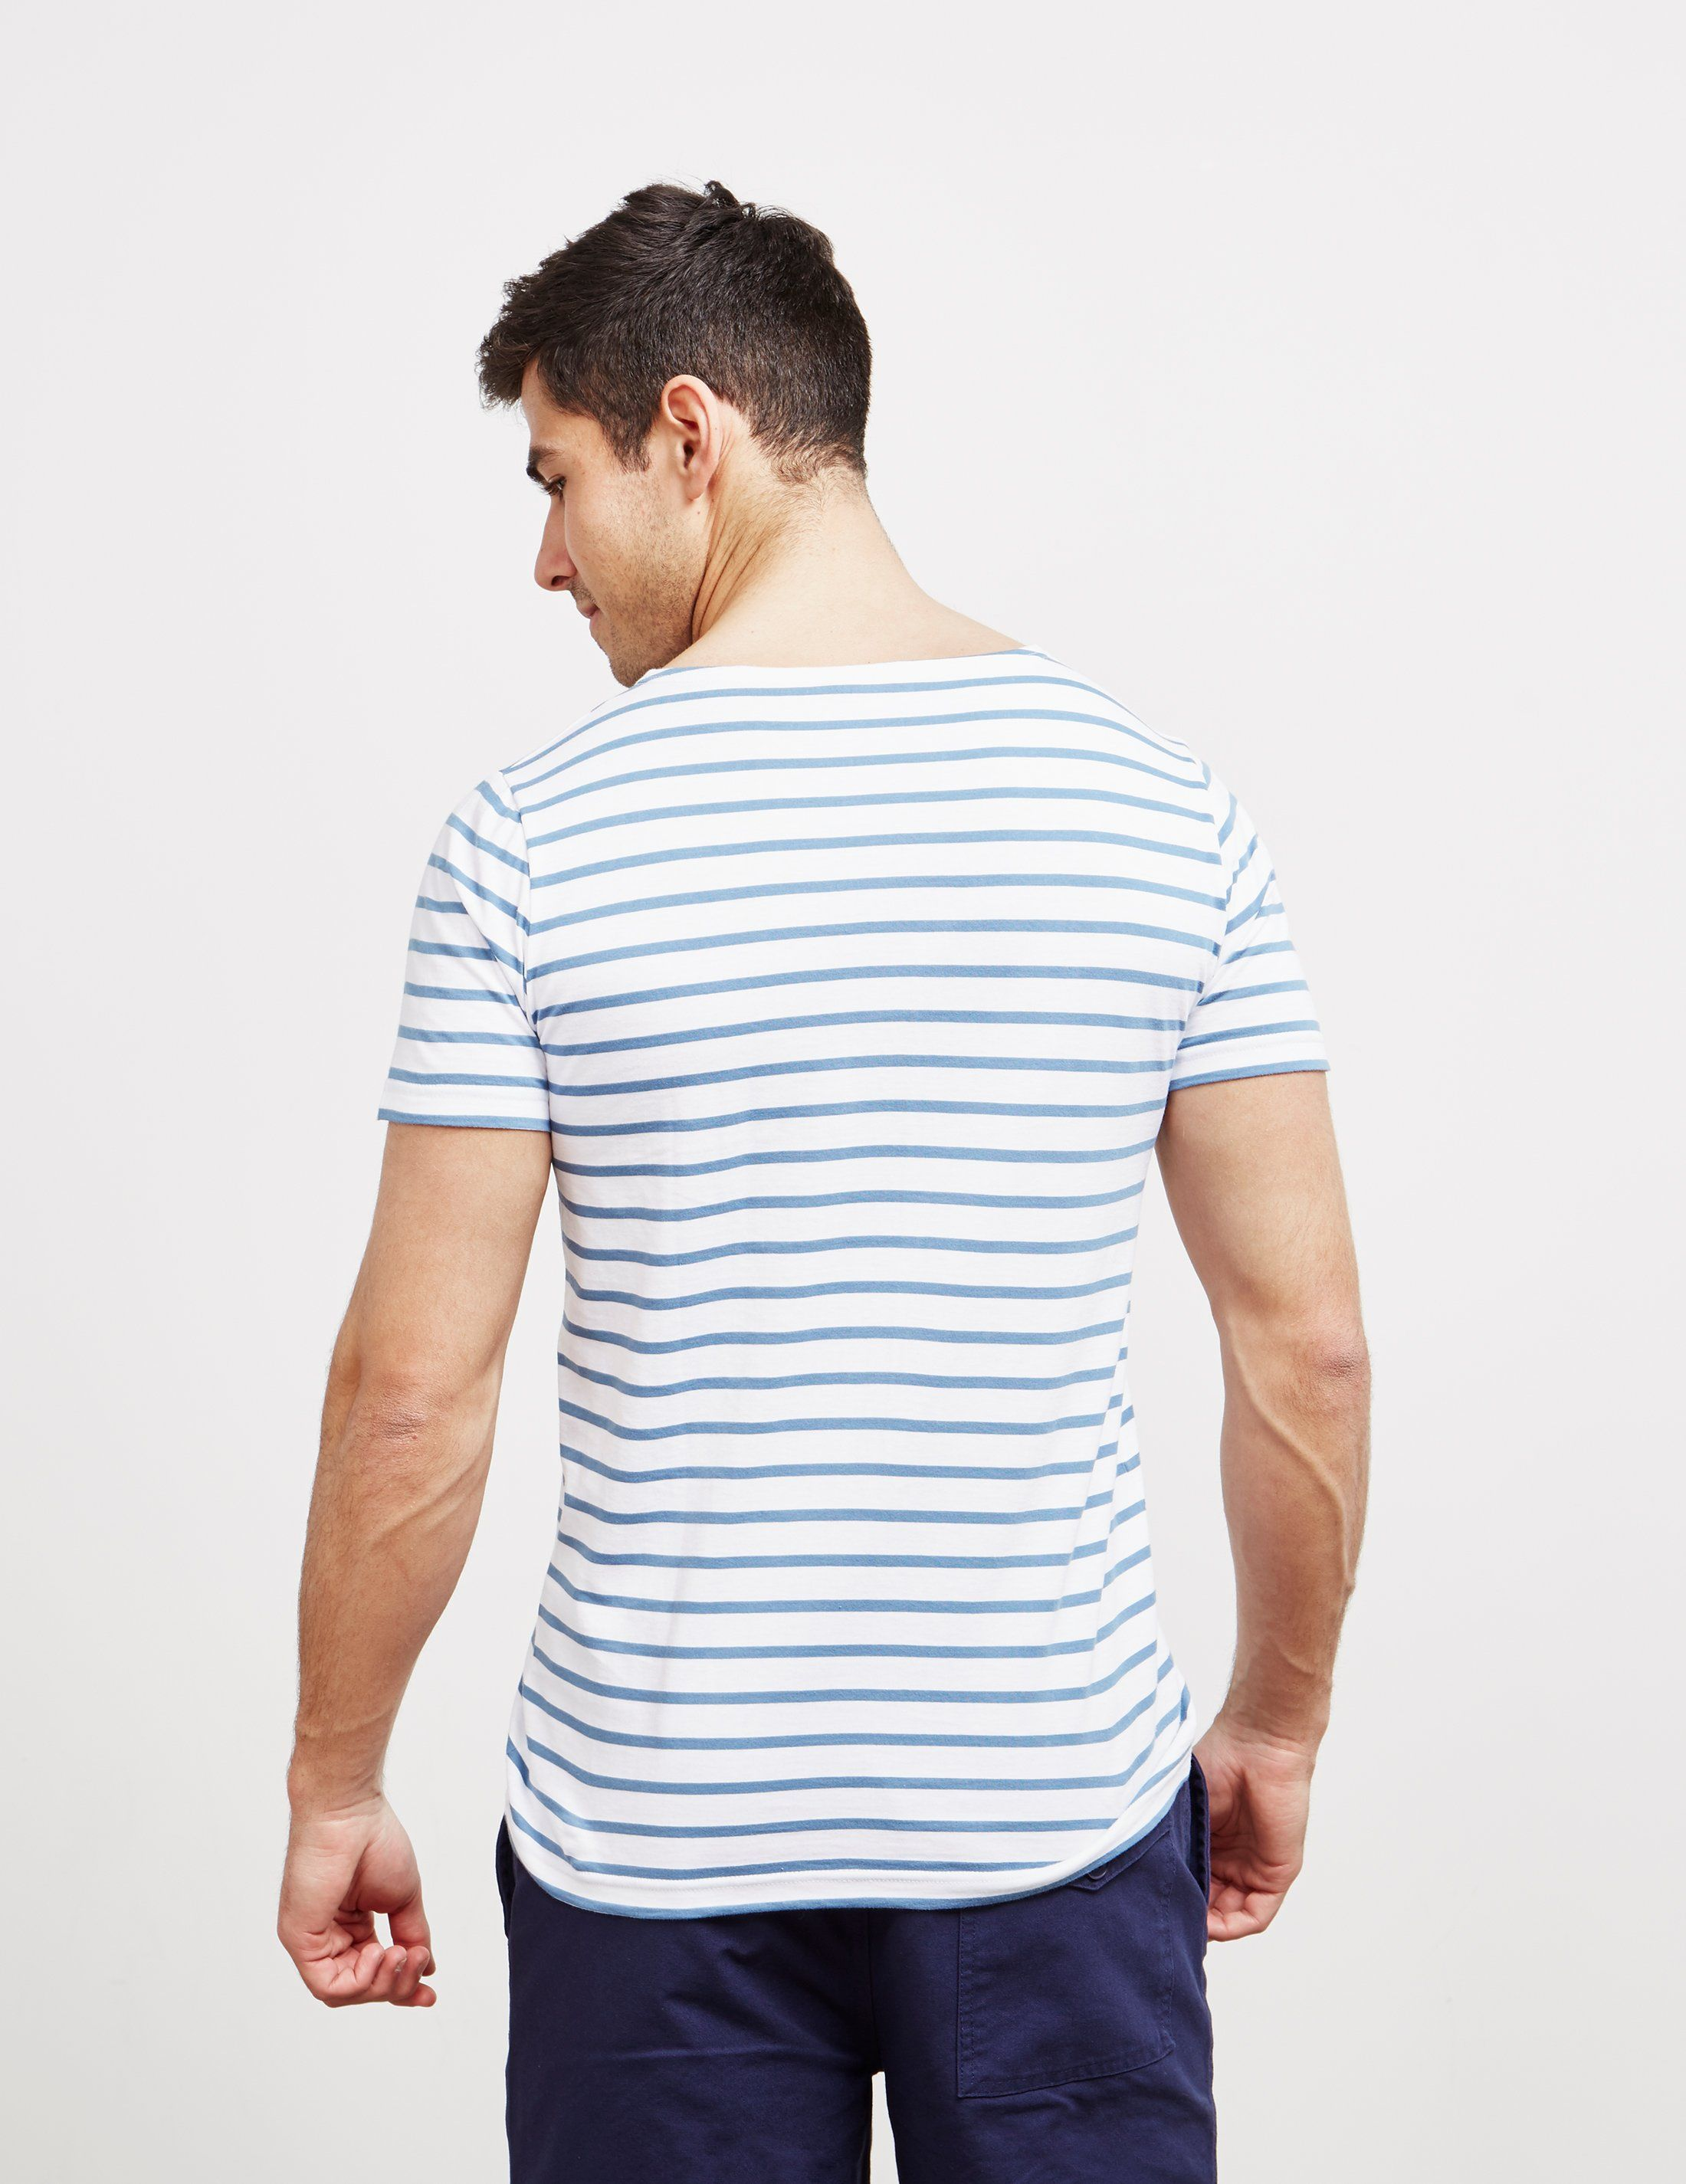 Armor Lux Small Stripe Short Sleeve T-Shirt